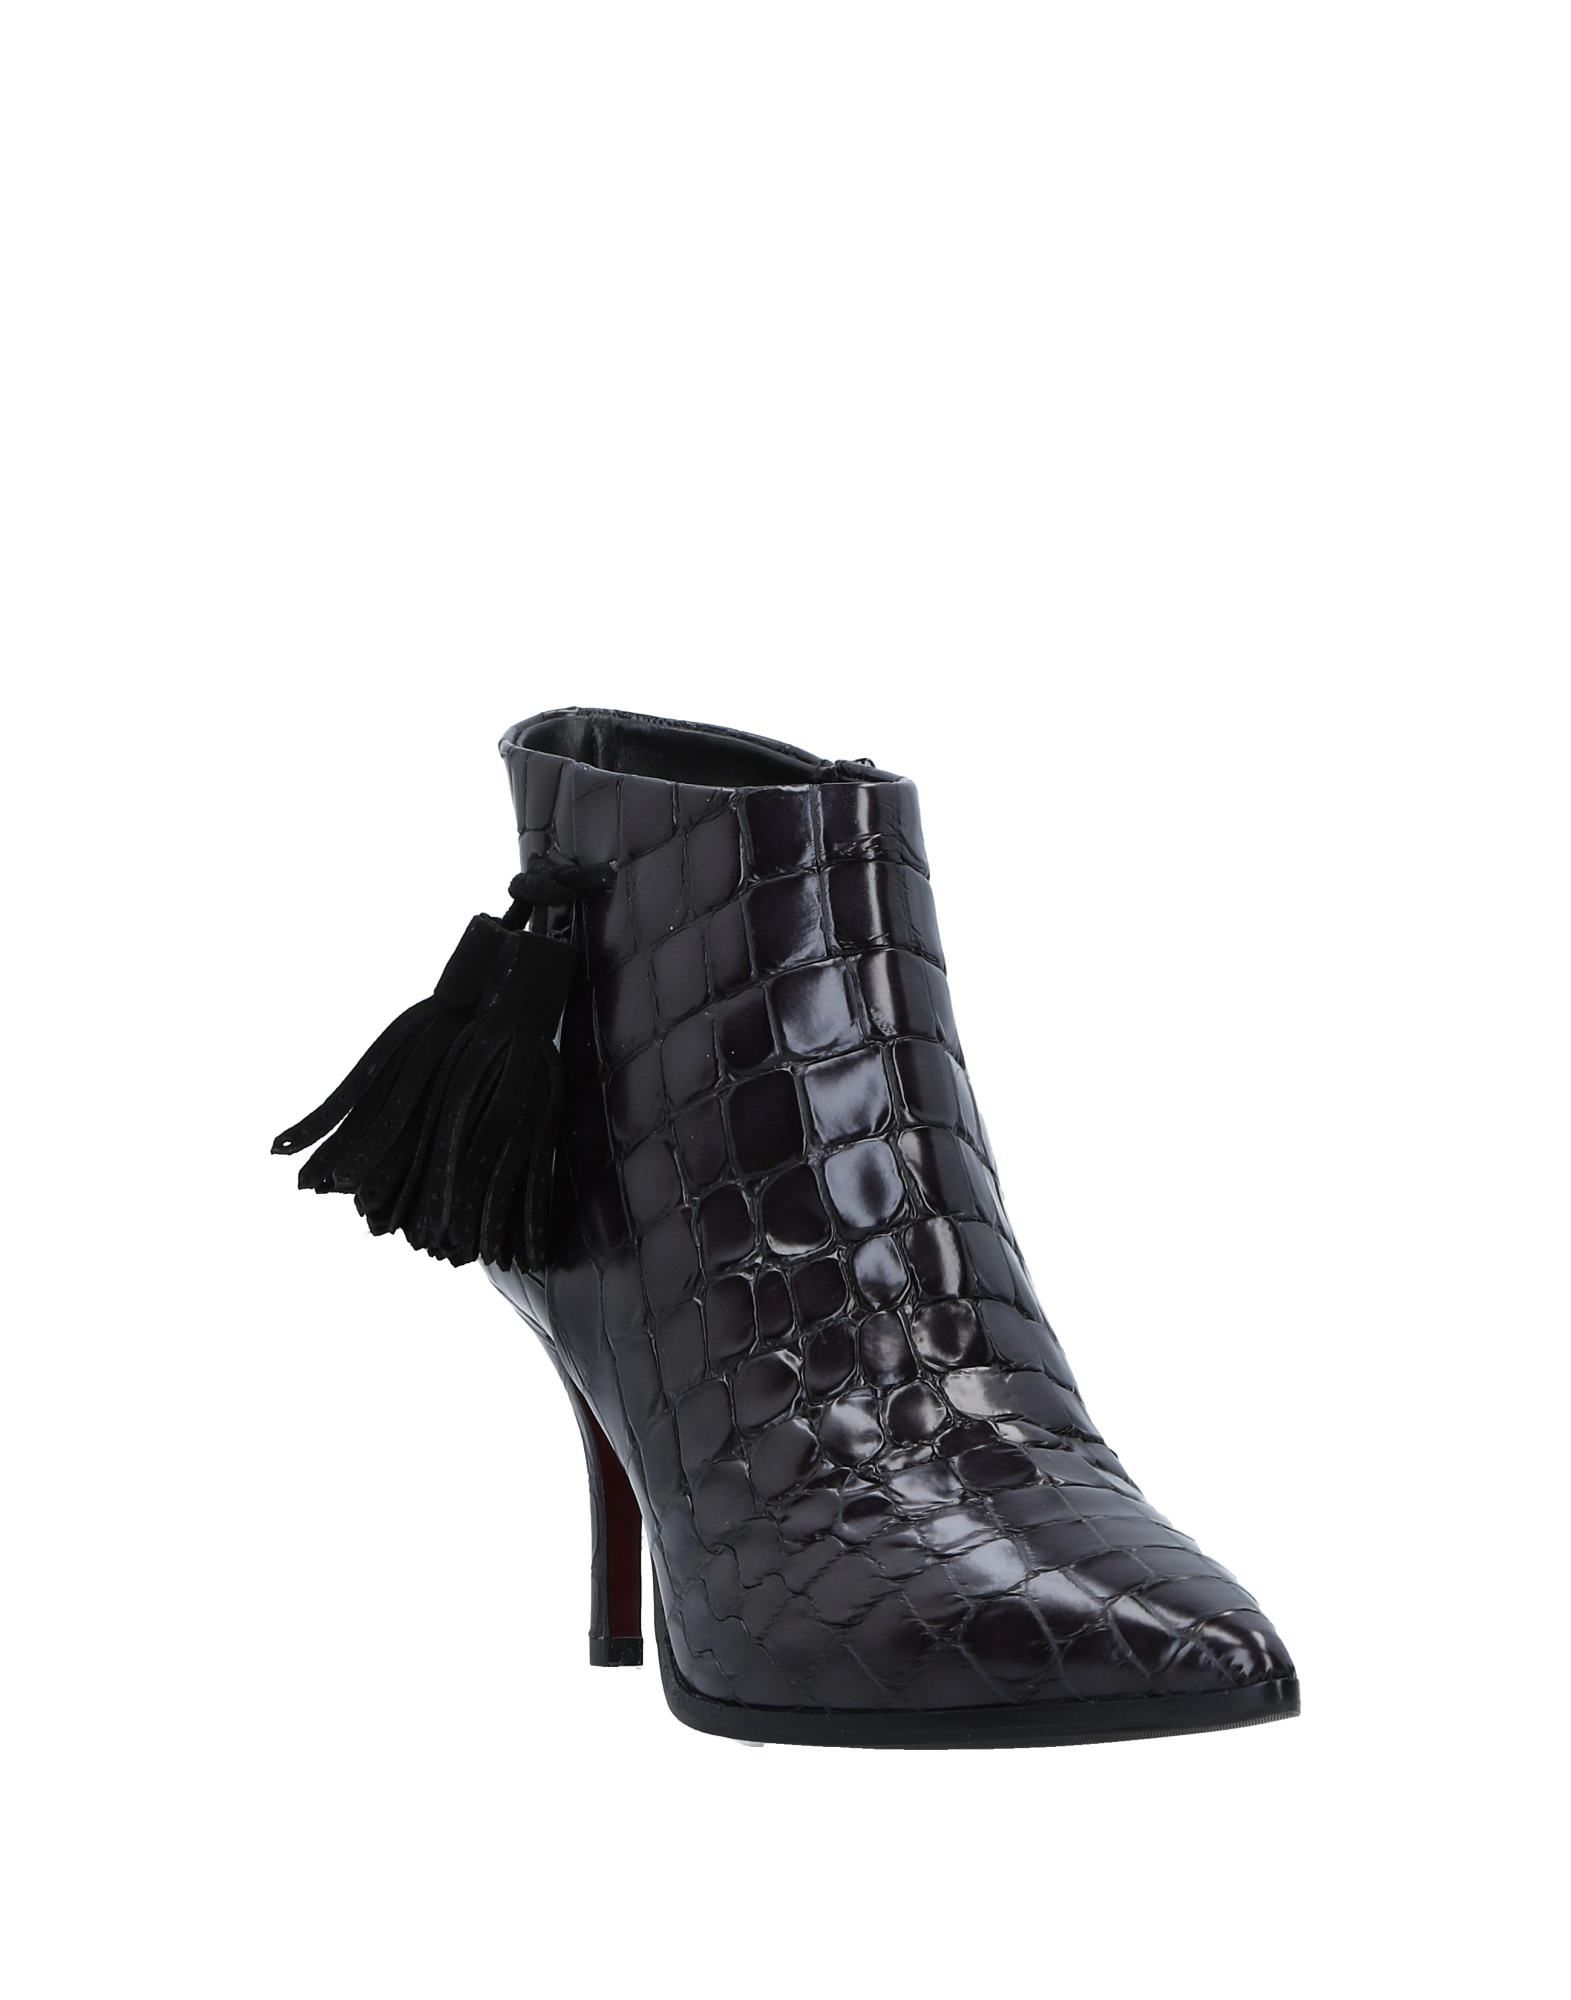 Fabi Schuhe Stiefelette Damen  11536093GI Heiße Schuhe Fabi 84bdc3